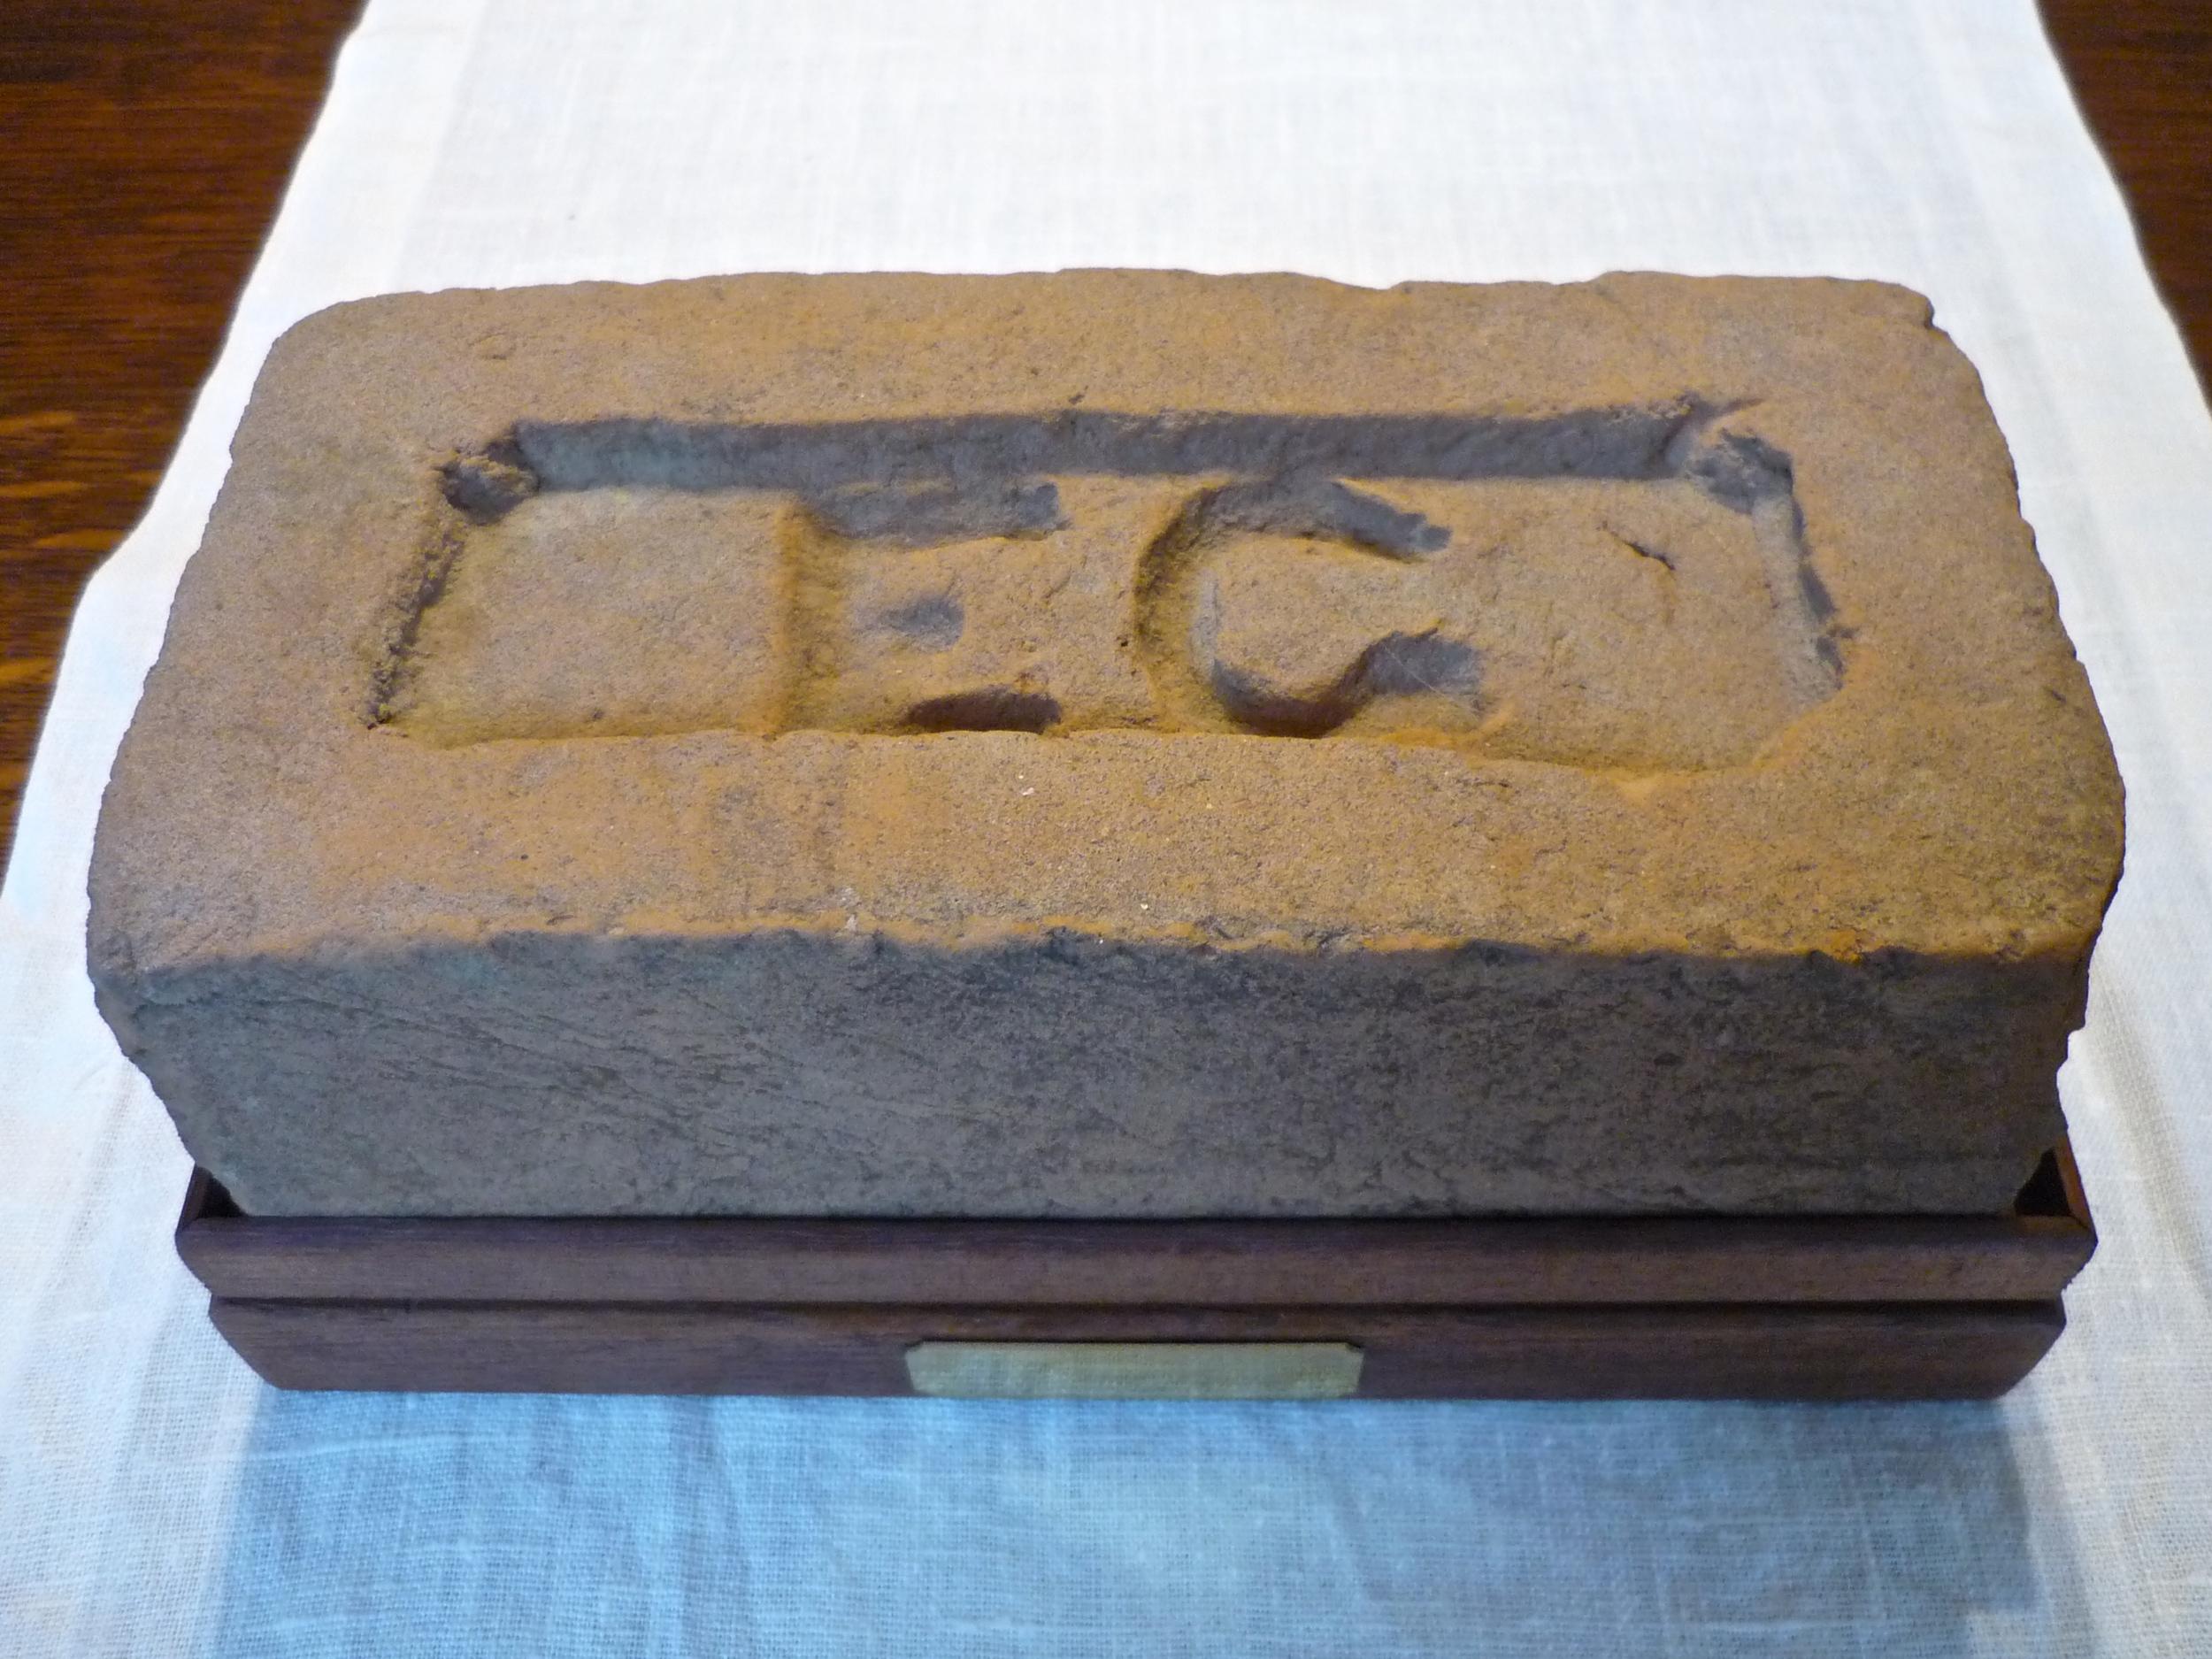 Brick made by Elijah Gadd